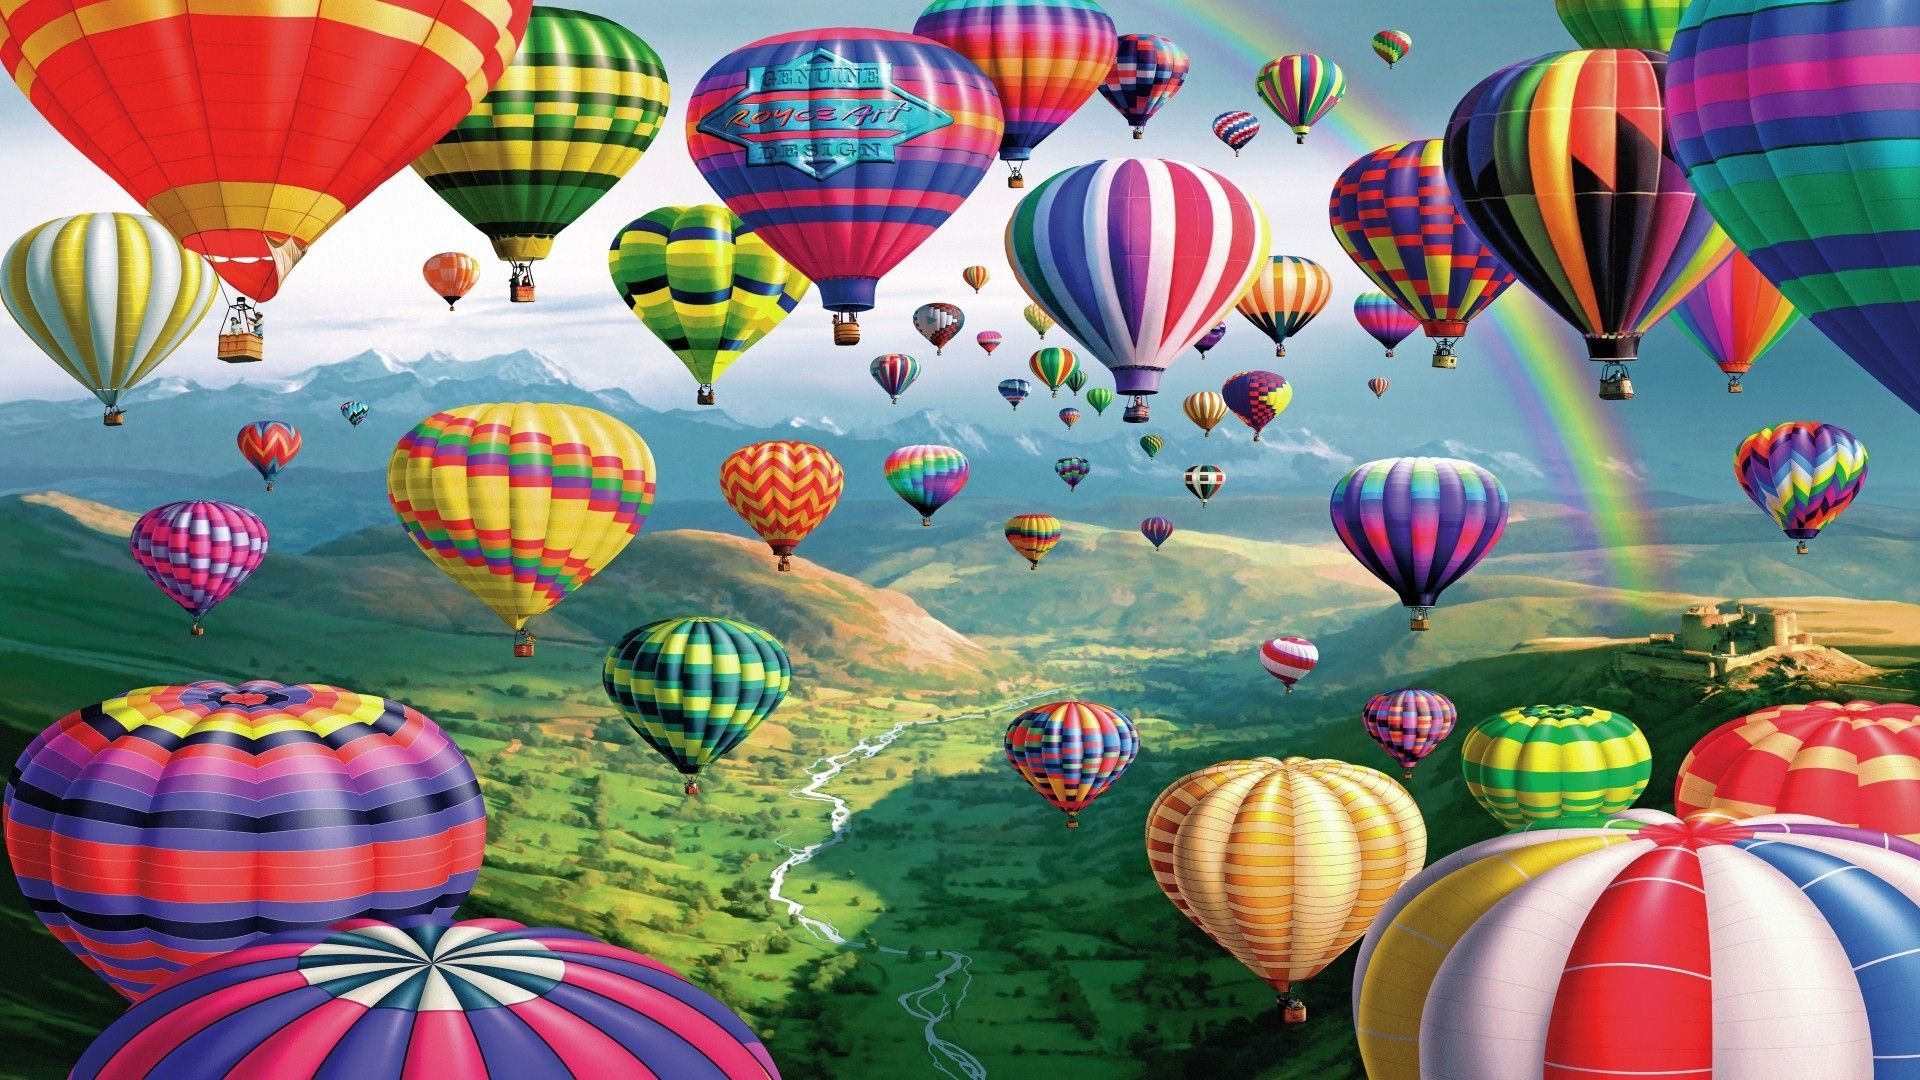 hotairballoonshdwallpaper581288jpg 19202151080